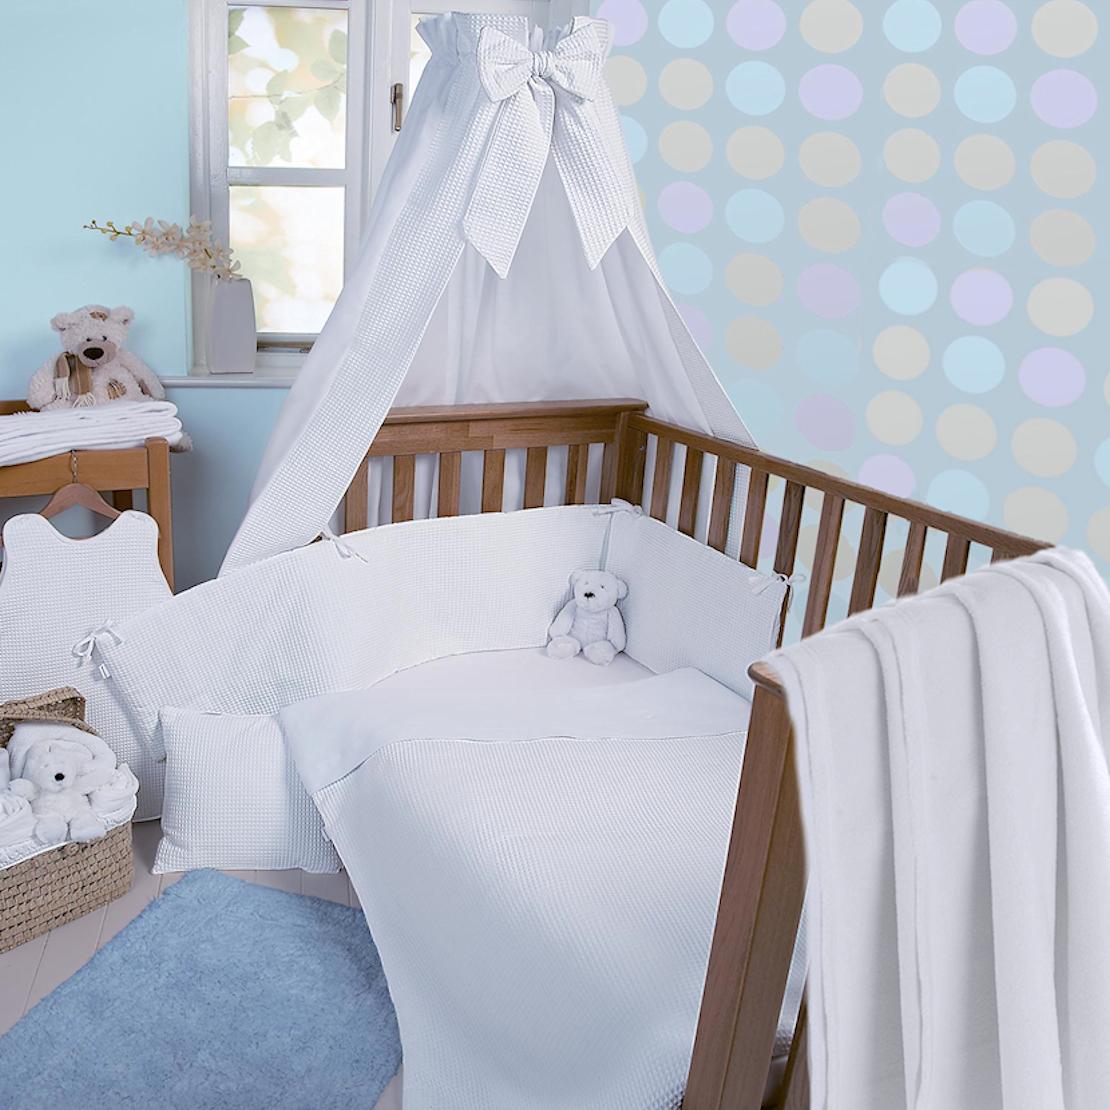 Clair De Lune Soft Waffle 3 Piece Cot Bed Bedding Bale White